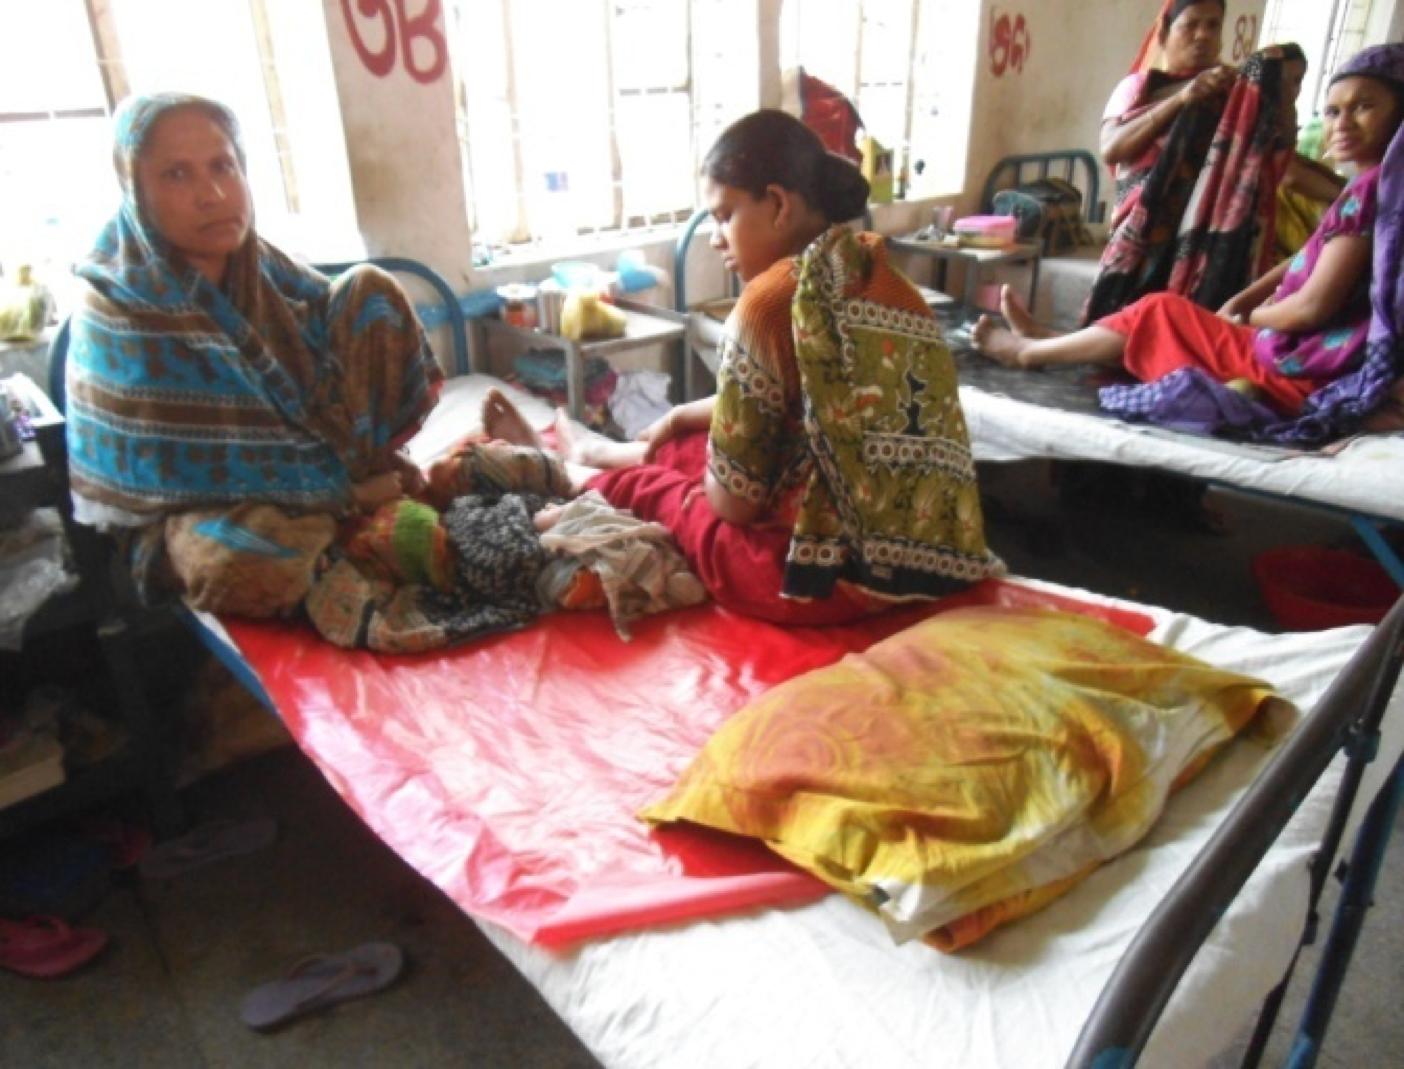 Women in hospital with their newborns